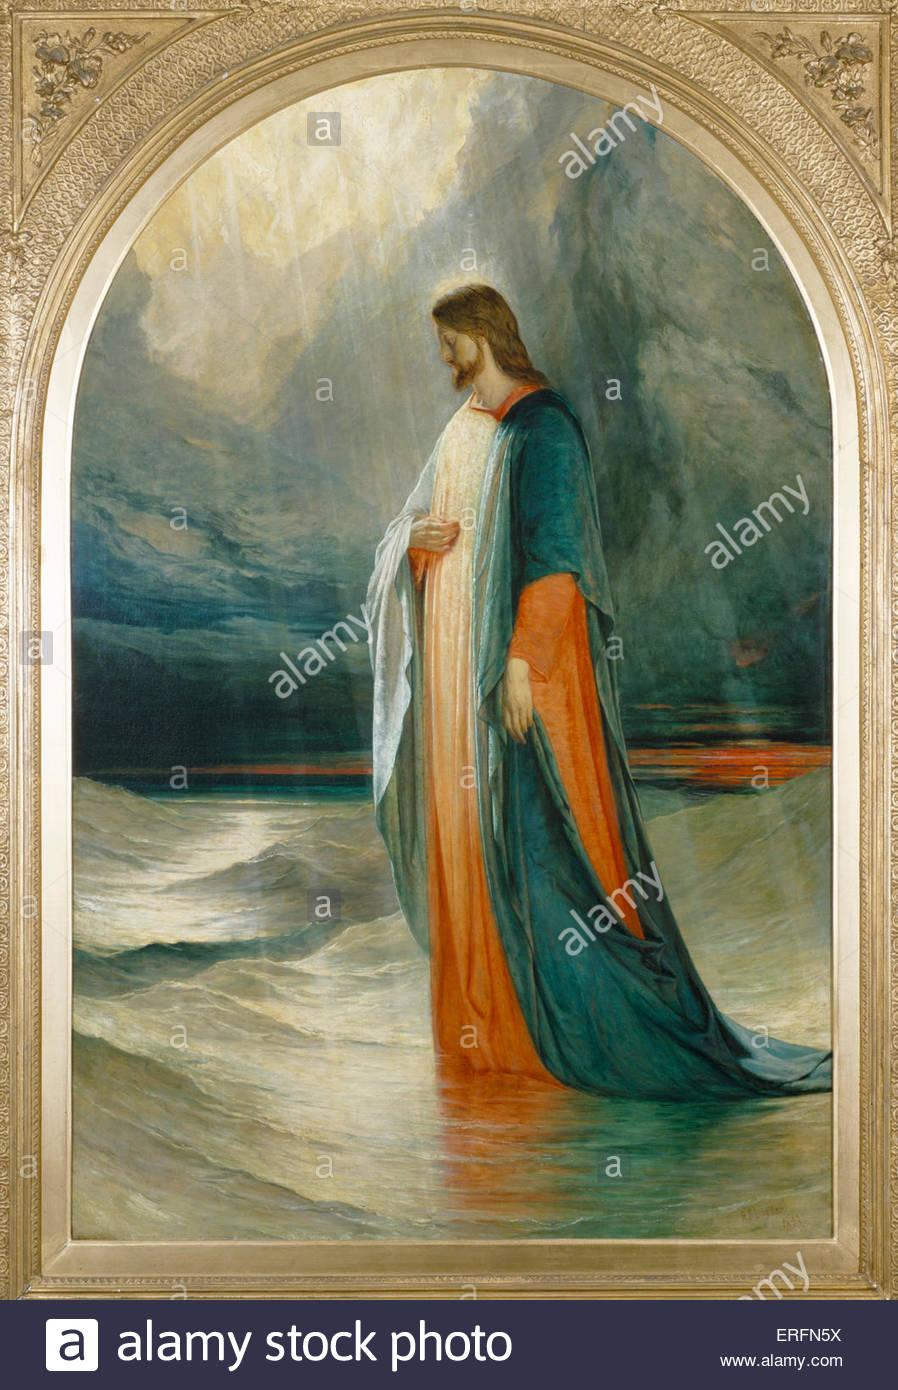 'Jesus went unto them, walking on the sea' - painting by Robert Scott Lauder.  Scottish artist: 1803 - 1869. - Stock Image